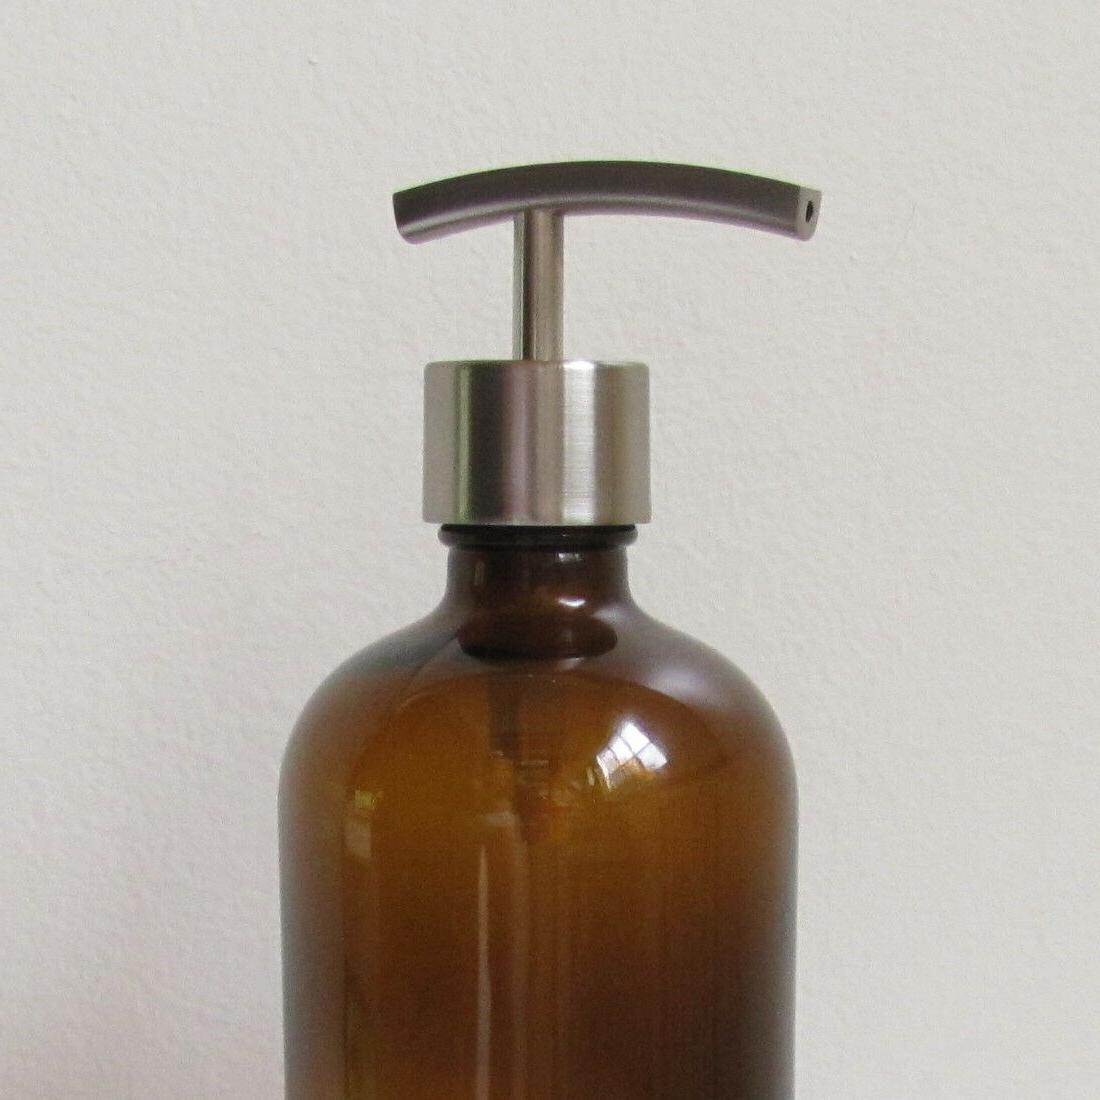 Amber Glass Soap Dispenser 16oz with Antique Copper Soap Dispenser Pump